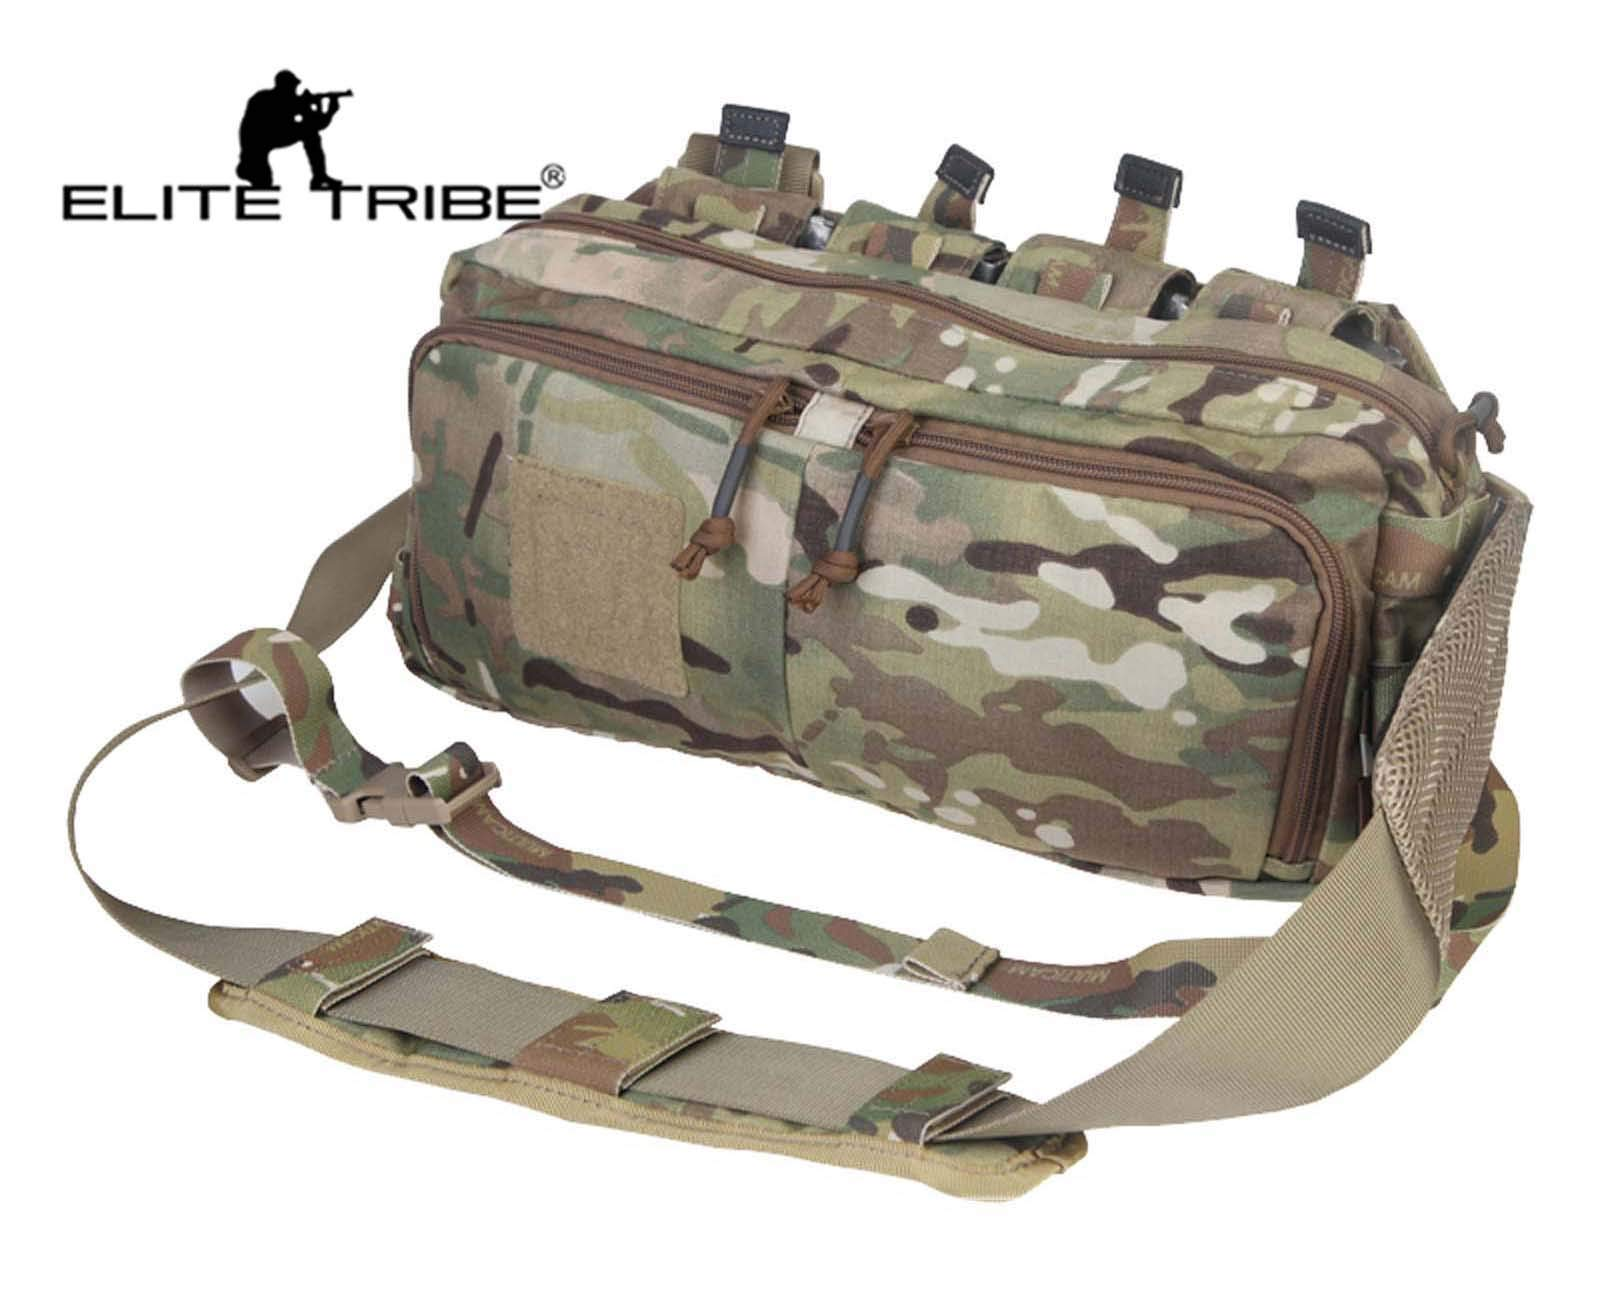 Elite Tribe Multi-Functional Sling Bag Waist Backpack Wargame Recon Multicam